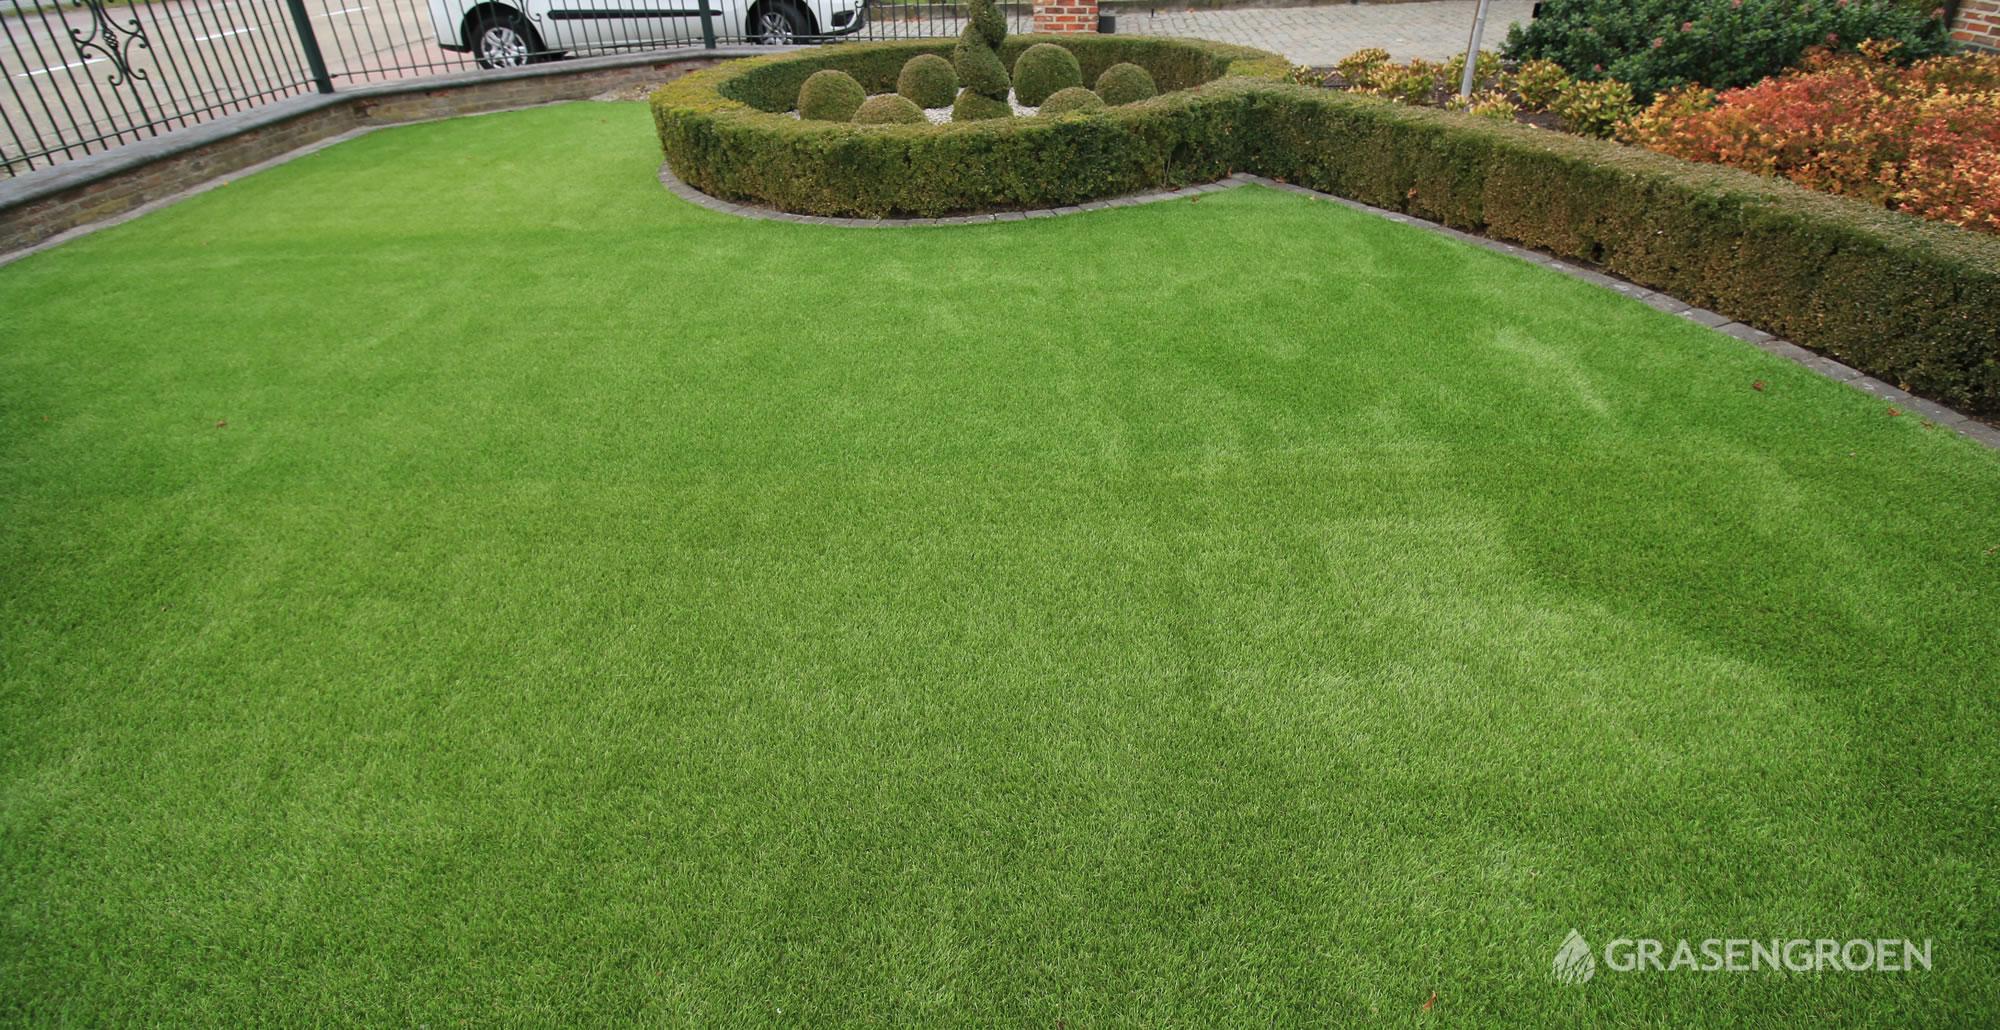 Kunstgrasleggenkermt13 • Gras en Groen Kunstgras